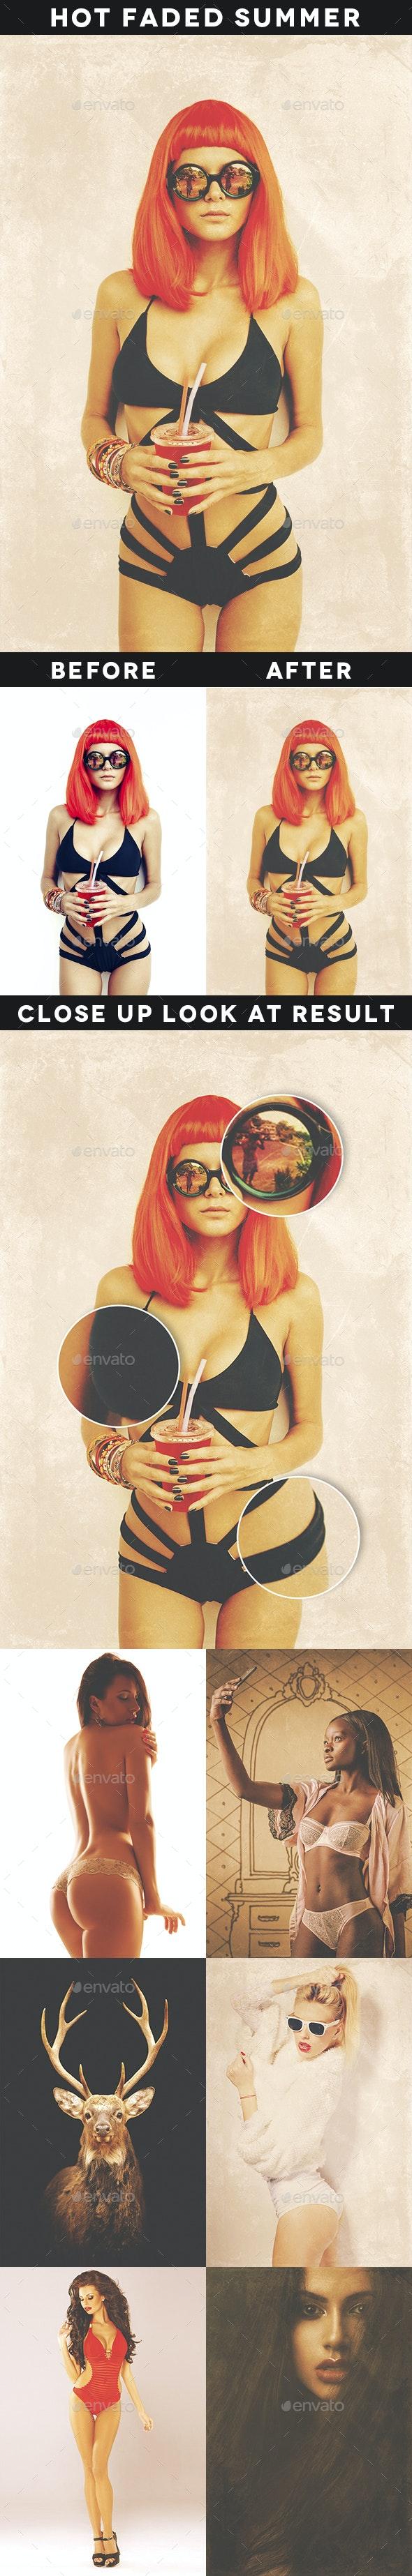 Hot Faded Summer Vol. 1  - Artistic Photo Templates